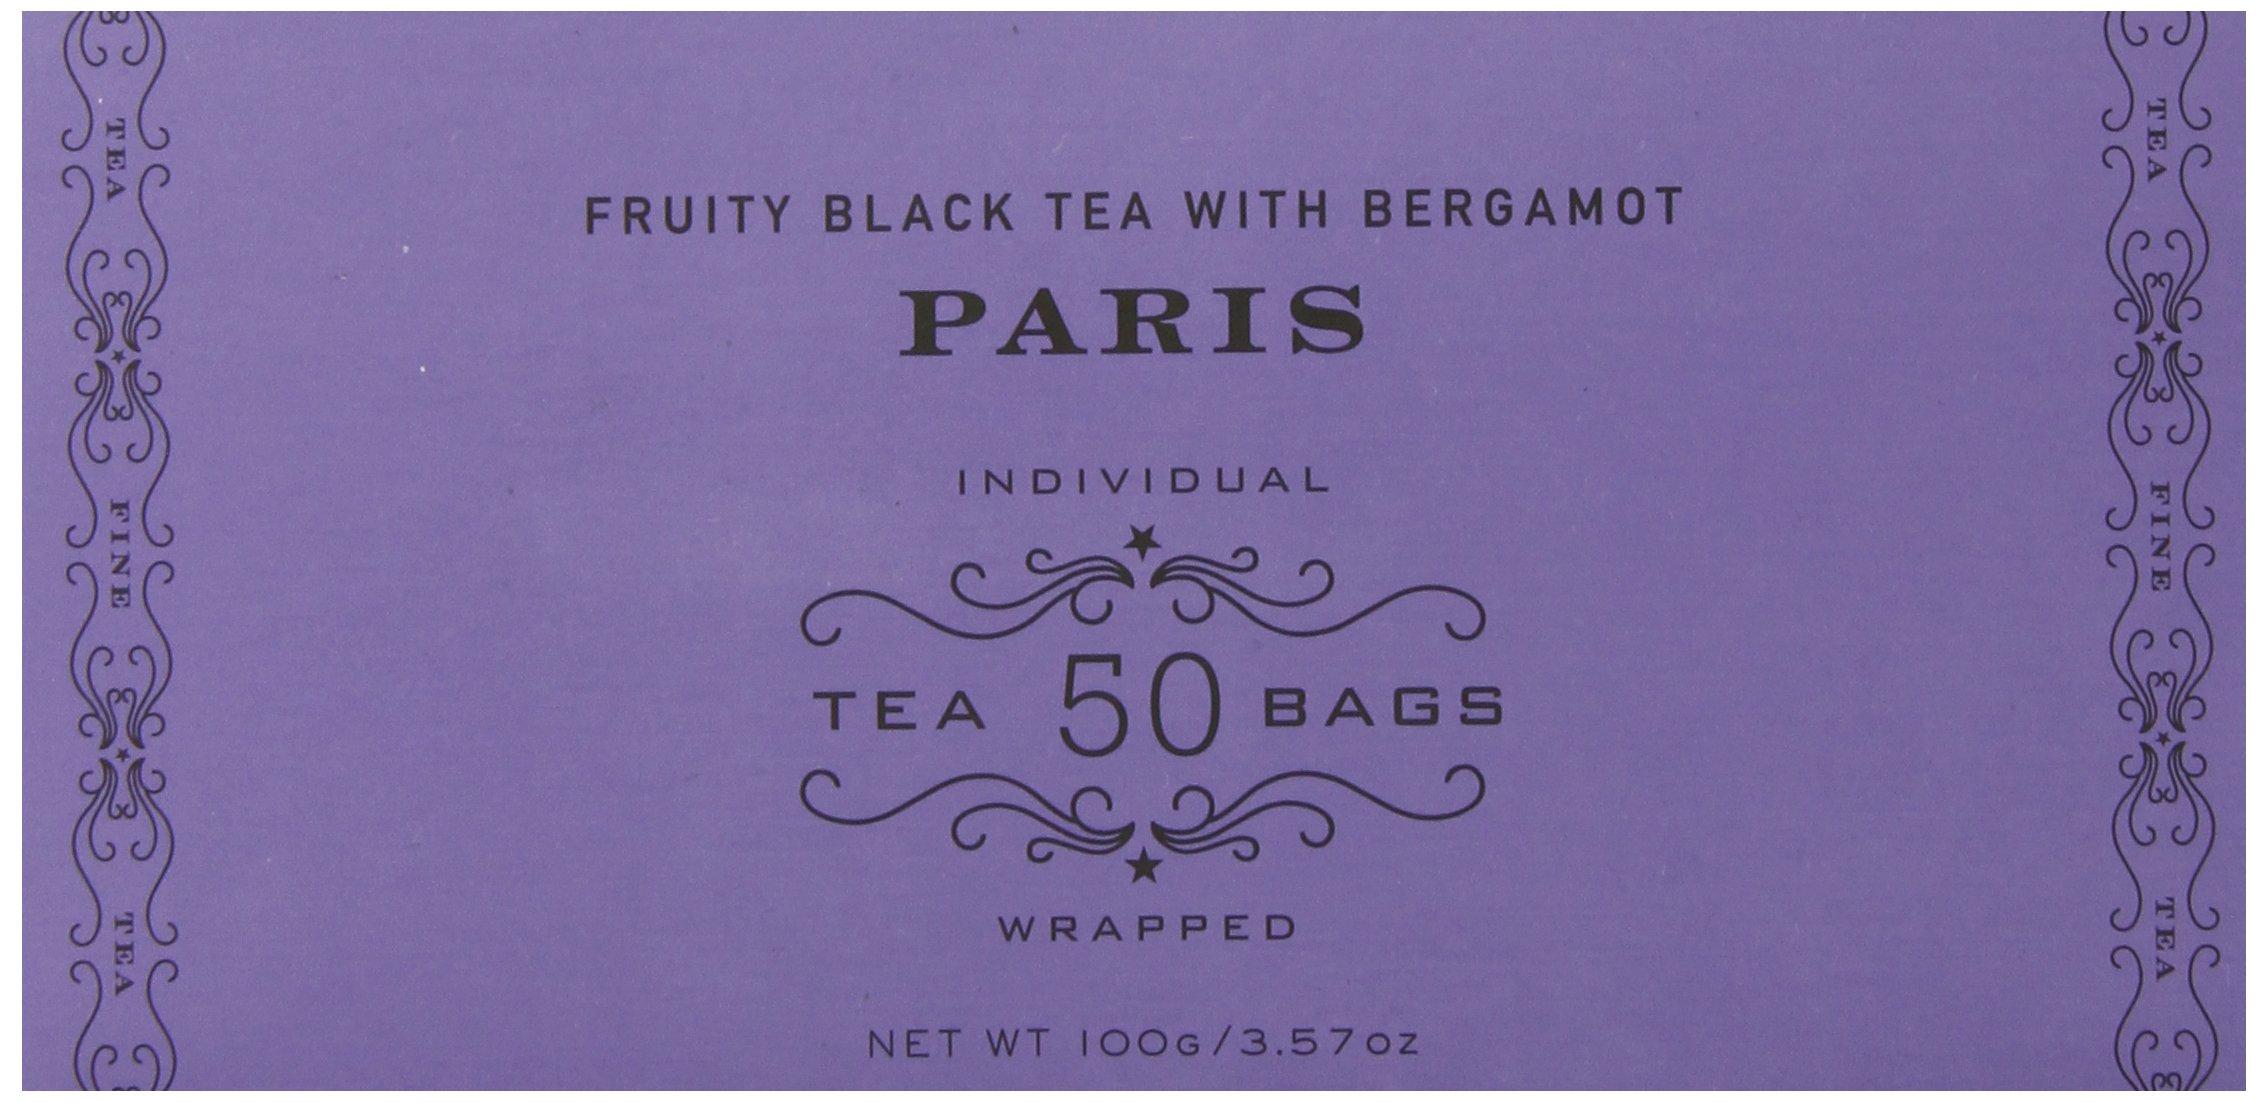 Harney & Sons Fruity Black Tea with Bergamot, Paris, 50 Tea Bags by Harney & Sons